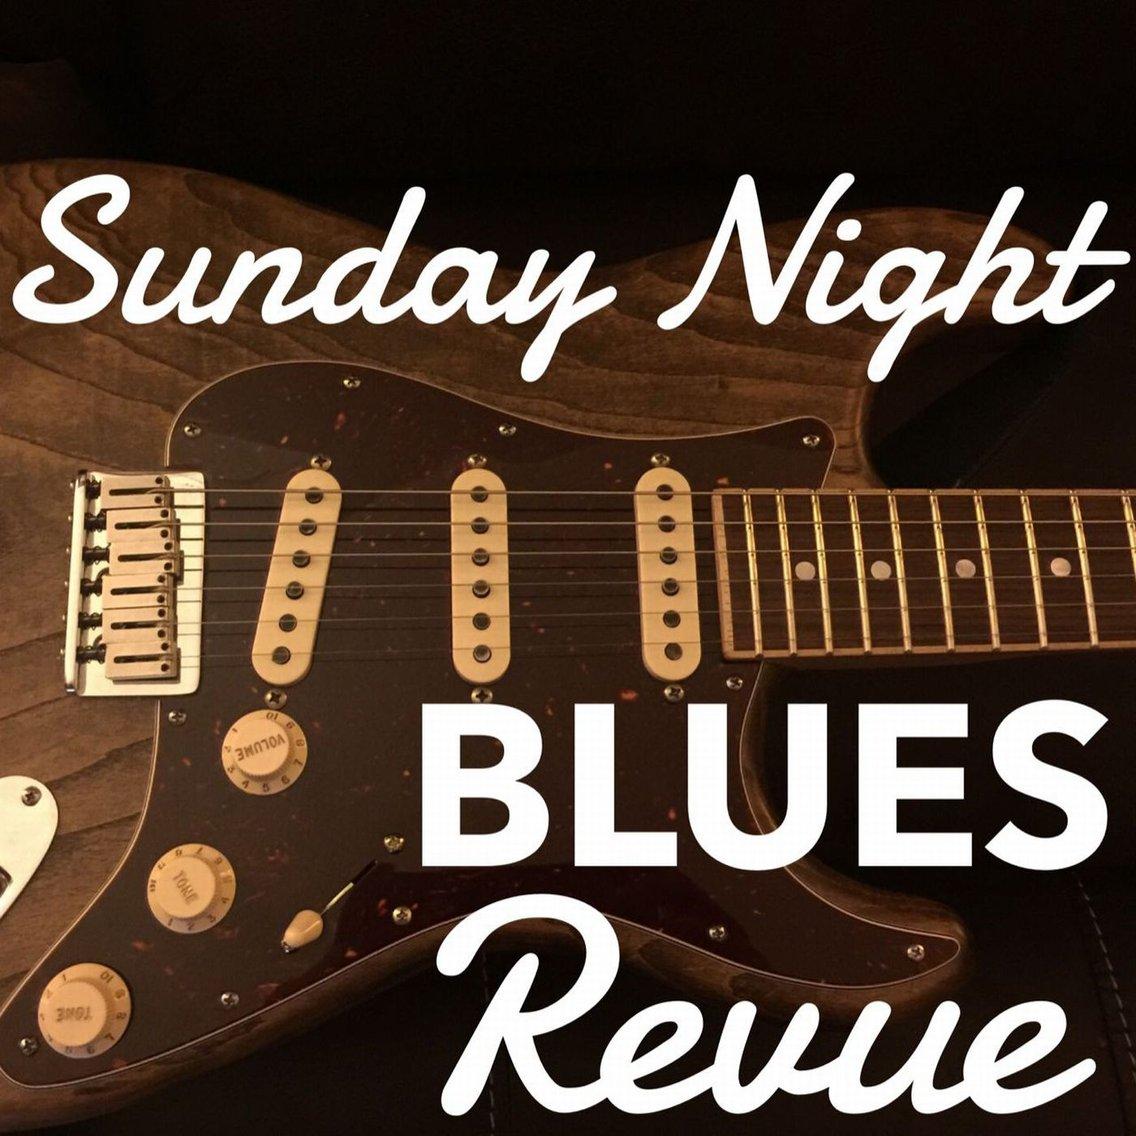 The Sunday Night Blues Revue - imagen de portada